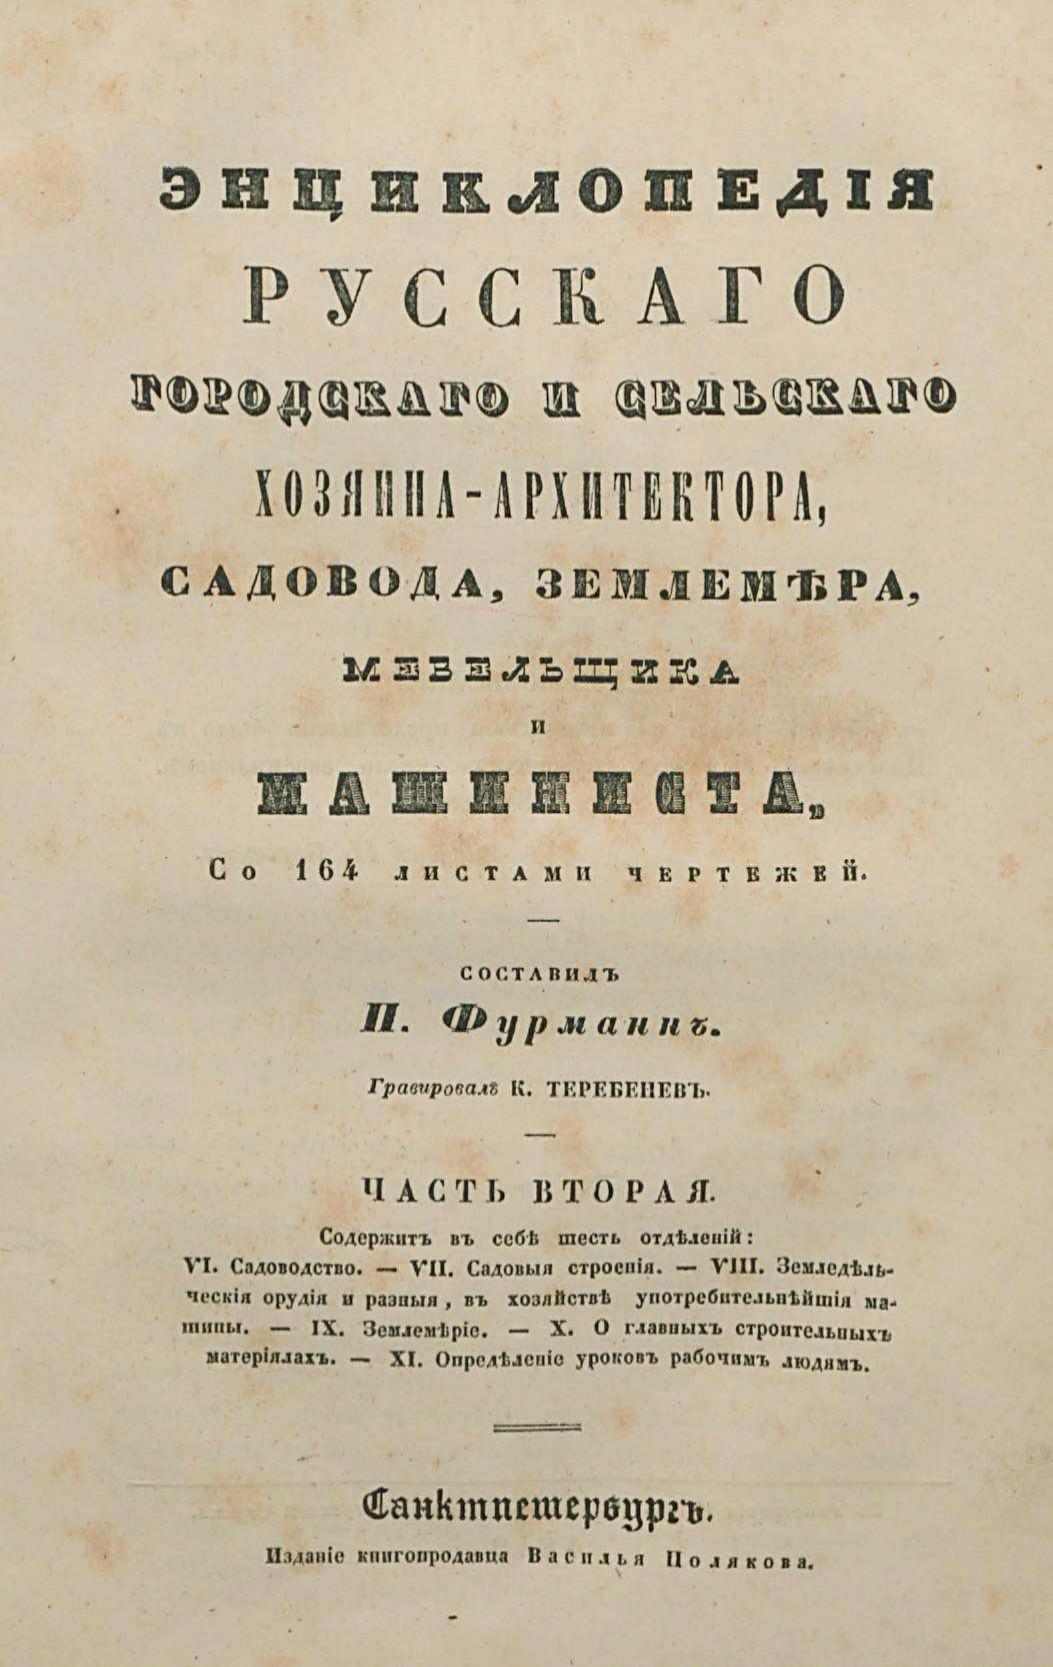 furmann-entciclopediia-russkogo-gorodskogo-i-selskogo-hoziaina-arhitektora-ch2-1842_Page3.jpg